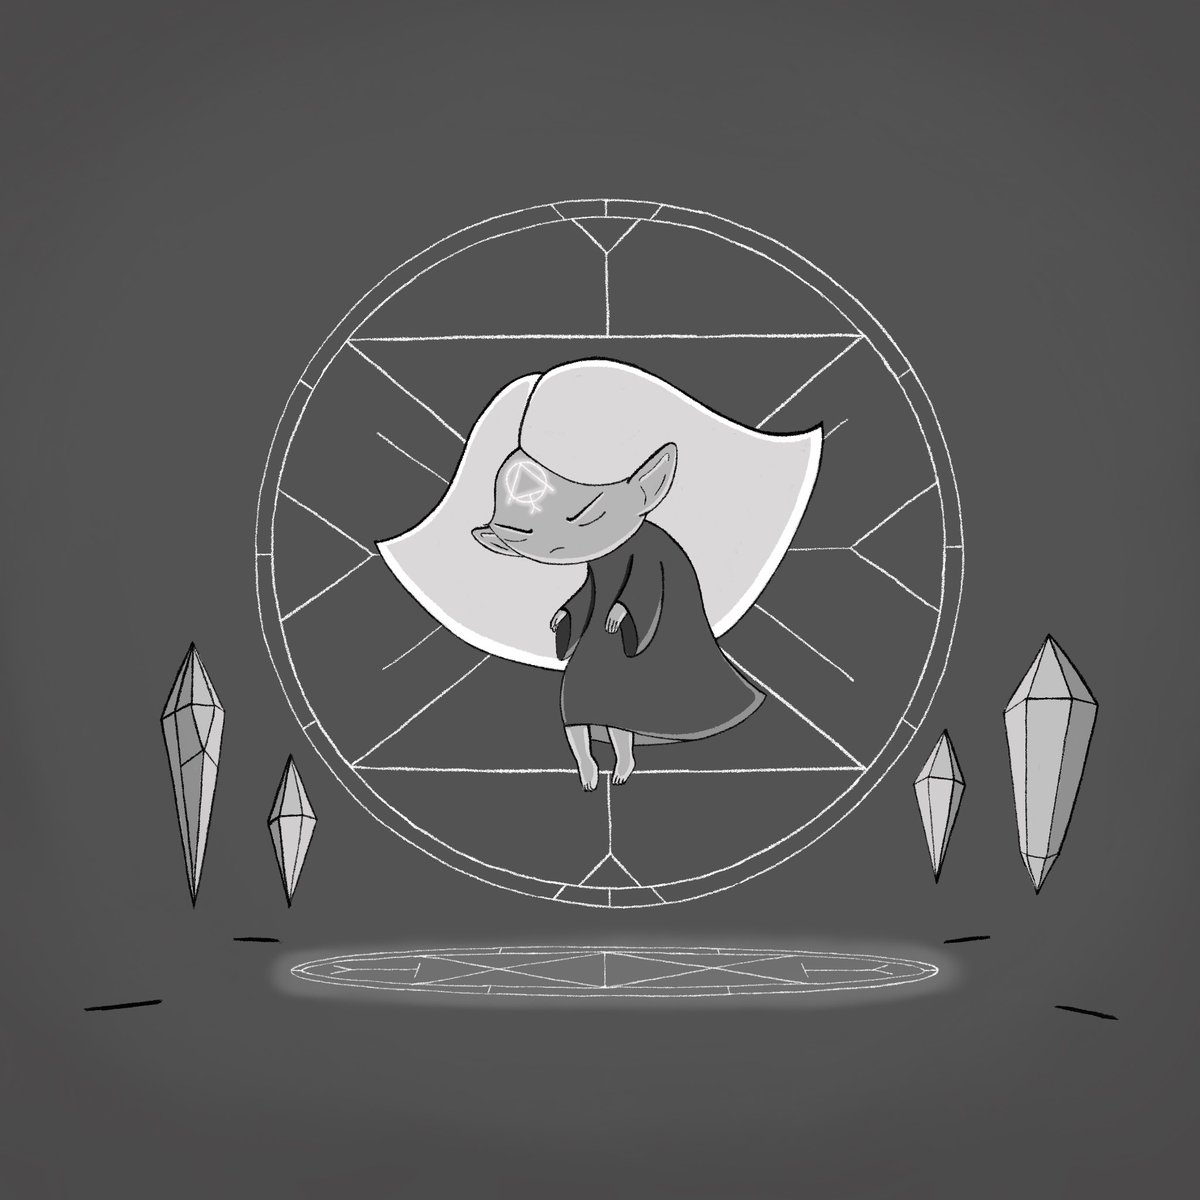 #illustration #characterdesign #procreate #witch #witchwednesday